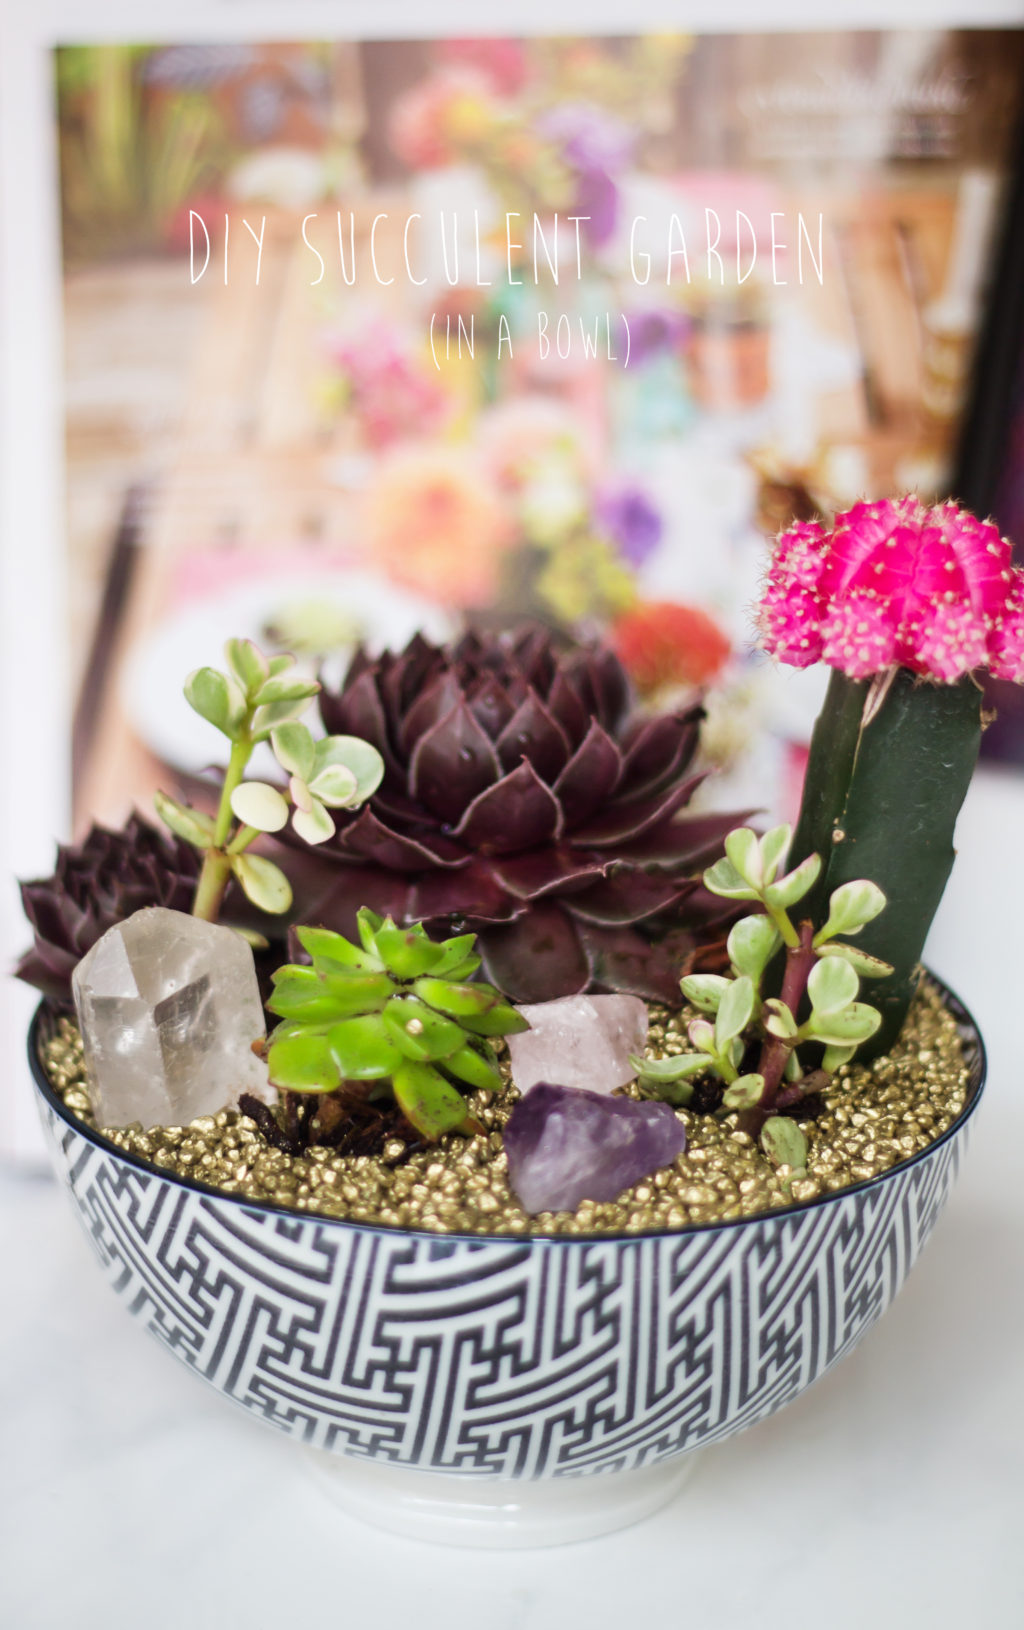 Diy Succulent Garden The Blondielocks Life Style